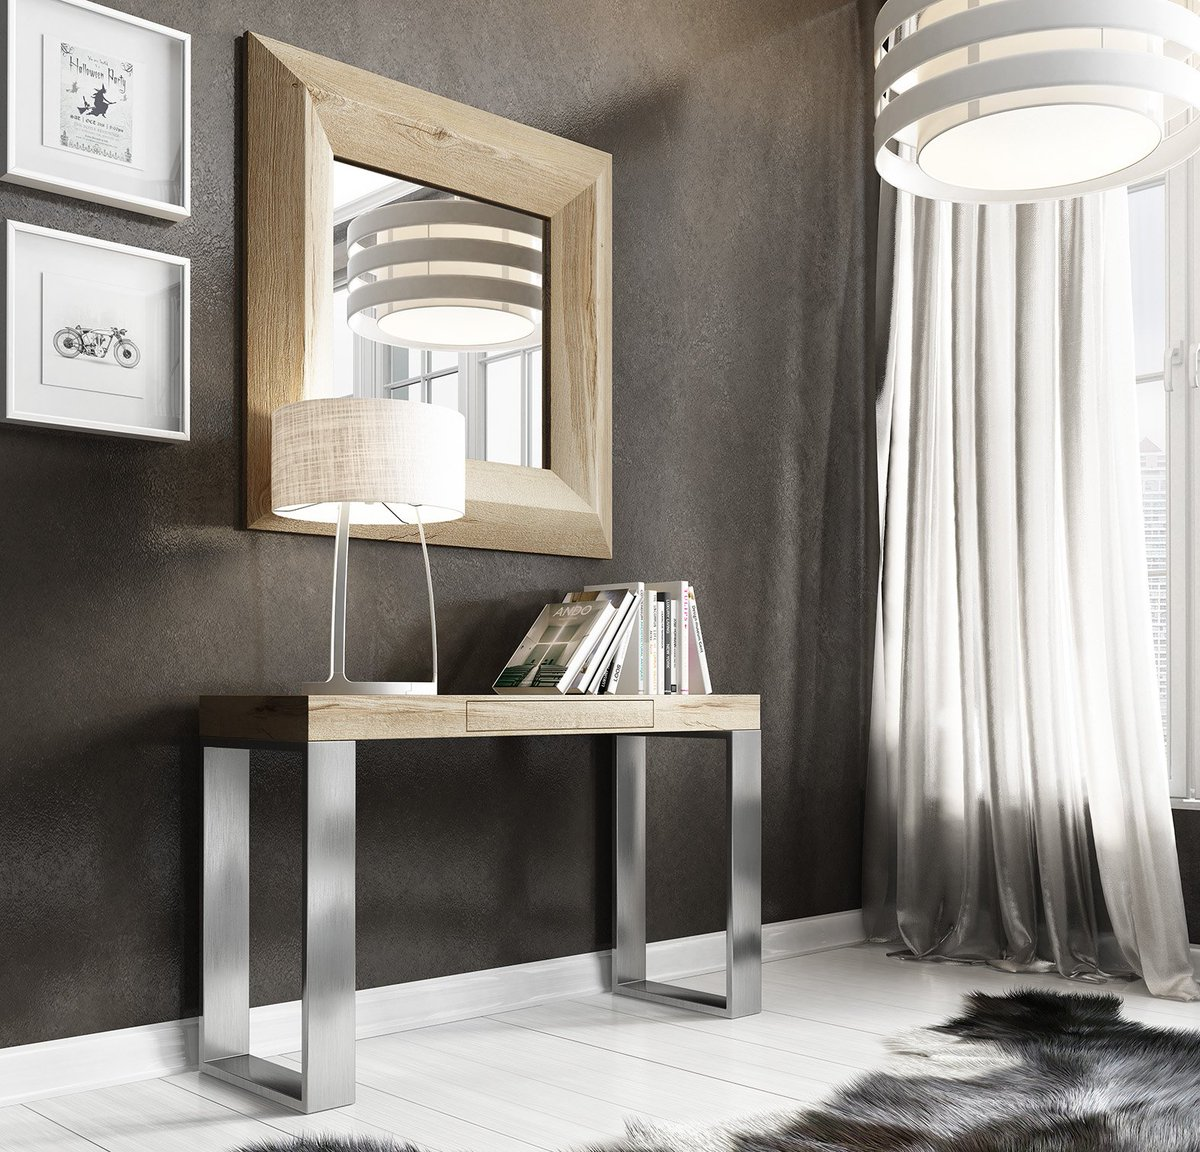 Muebles Mesa En Lucena Elegant Cool With Muebles Mesa En Lucena  # Muebles Mebol Lucena